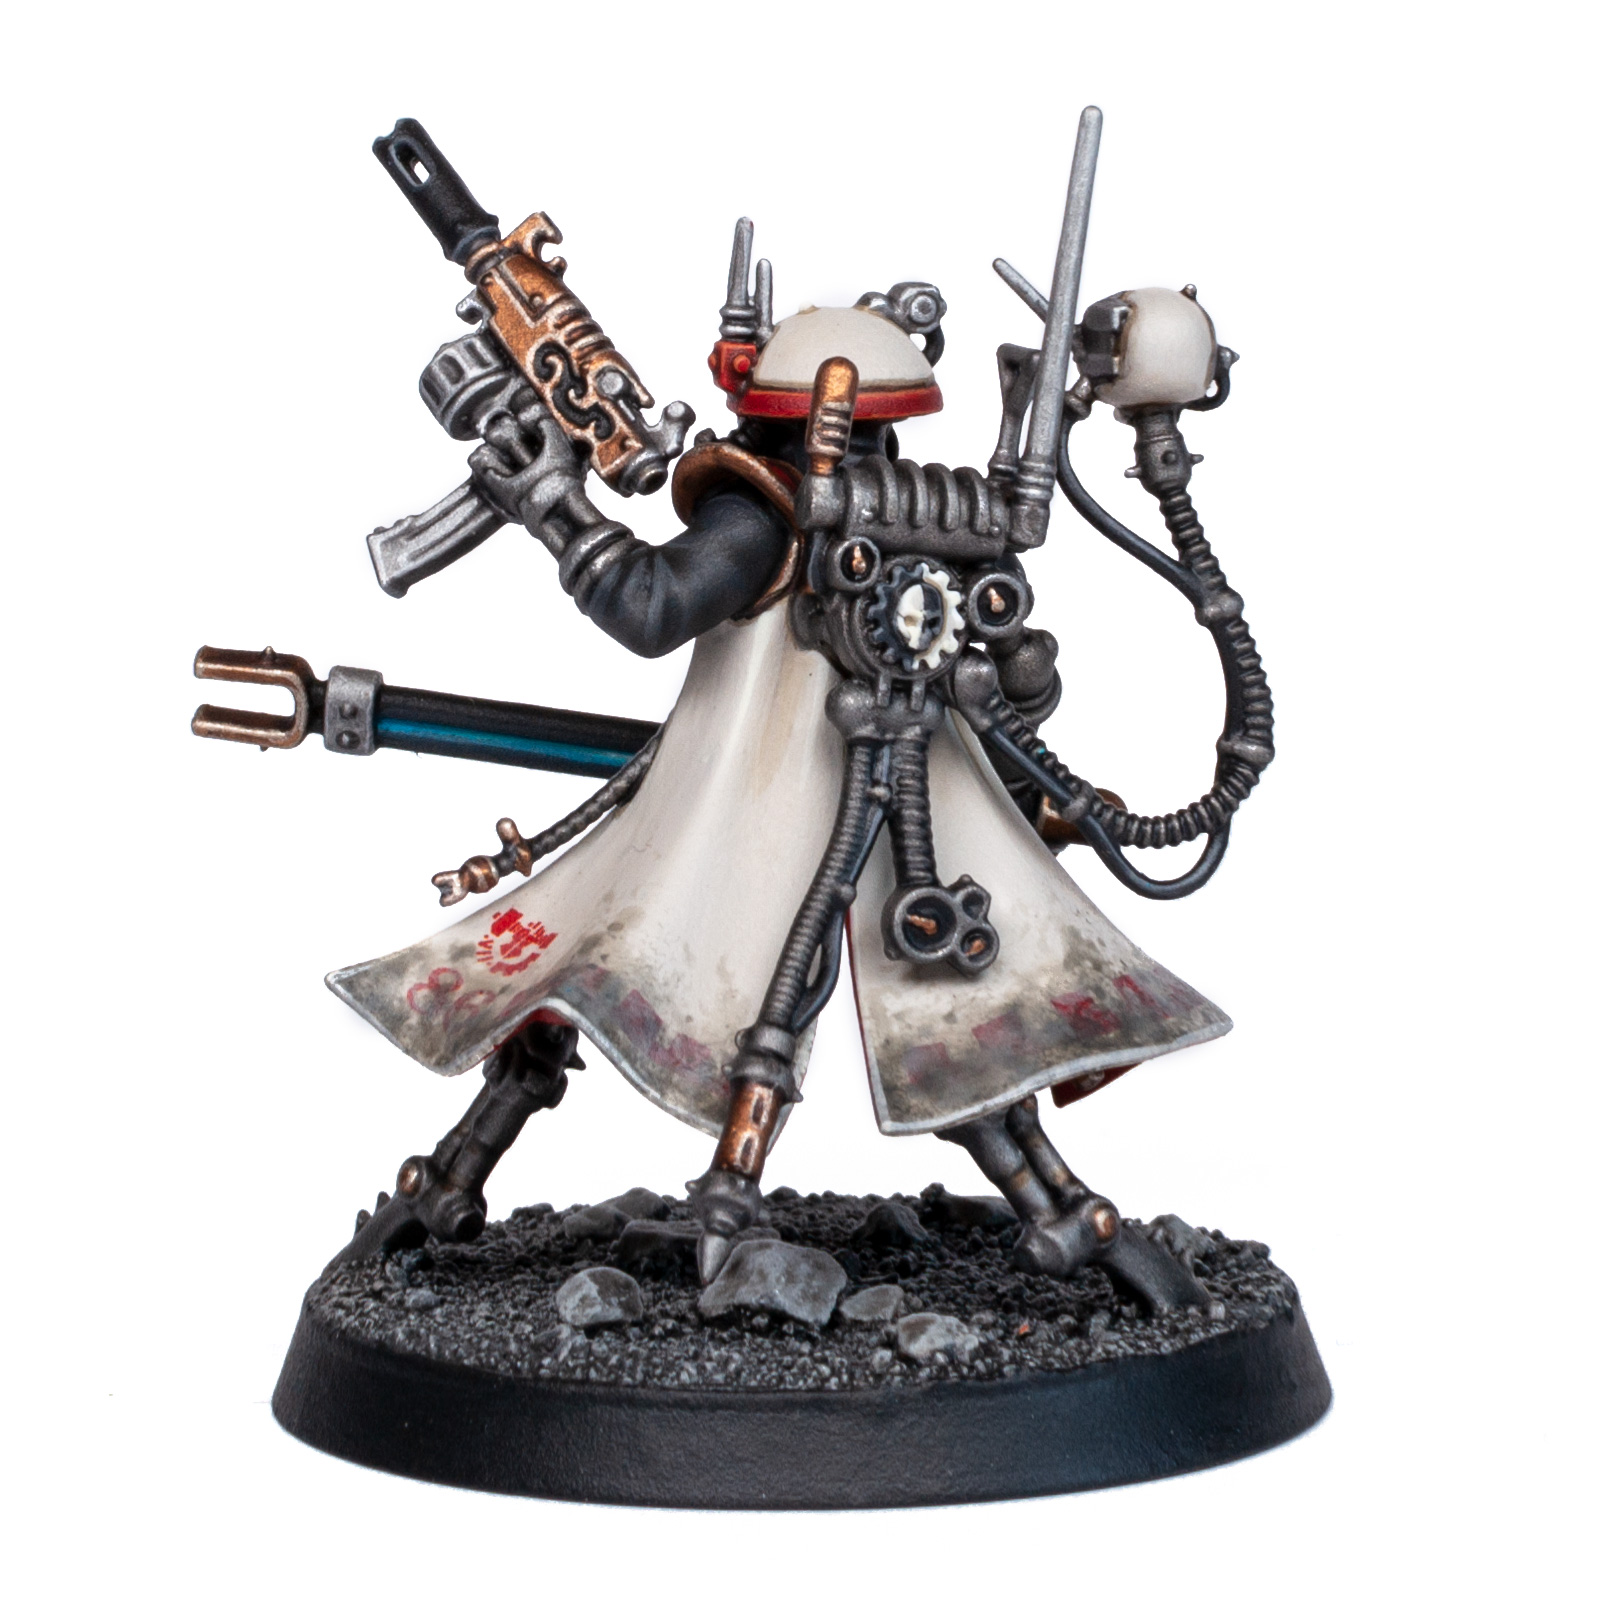 Adeptus Mechanicus Forge World Metalica Sicarian Infiltrator Princeps back